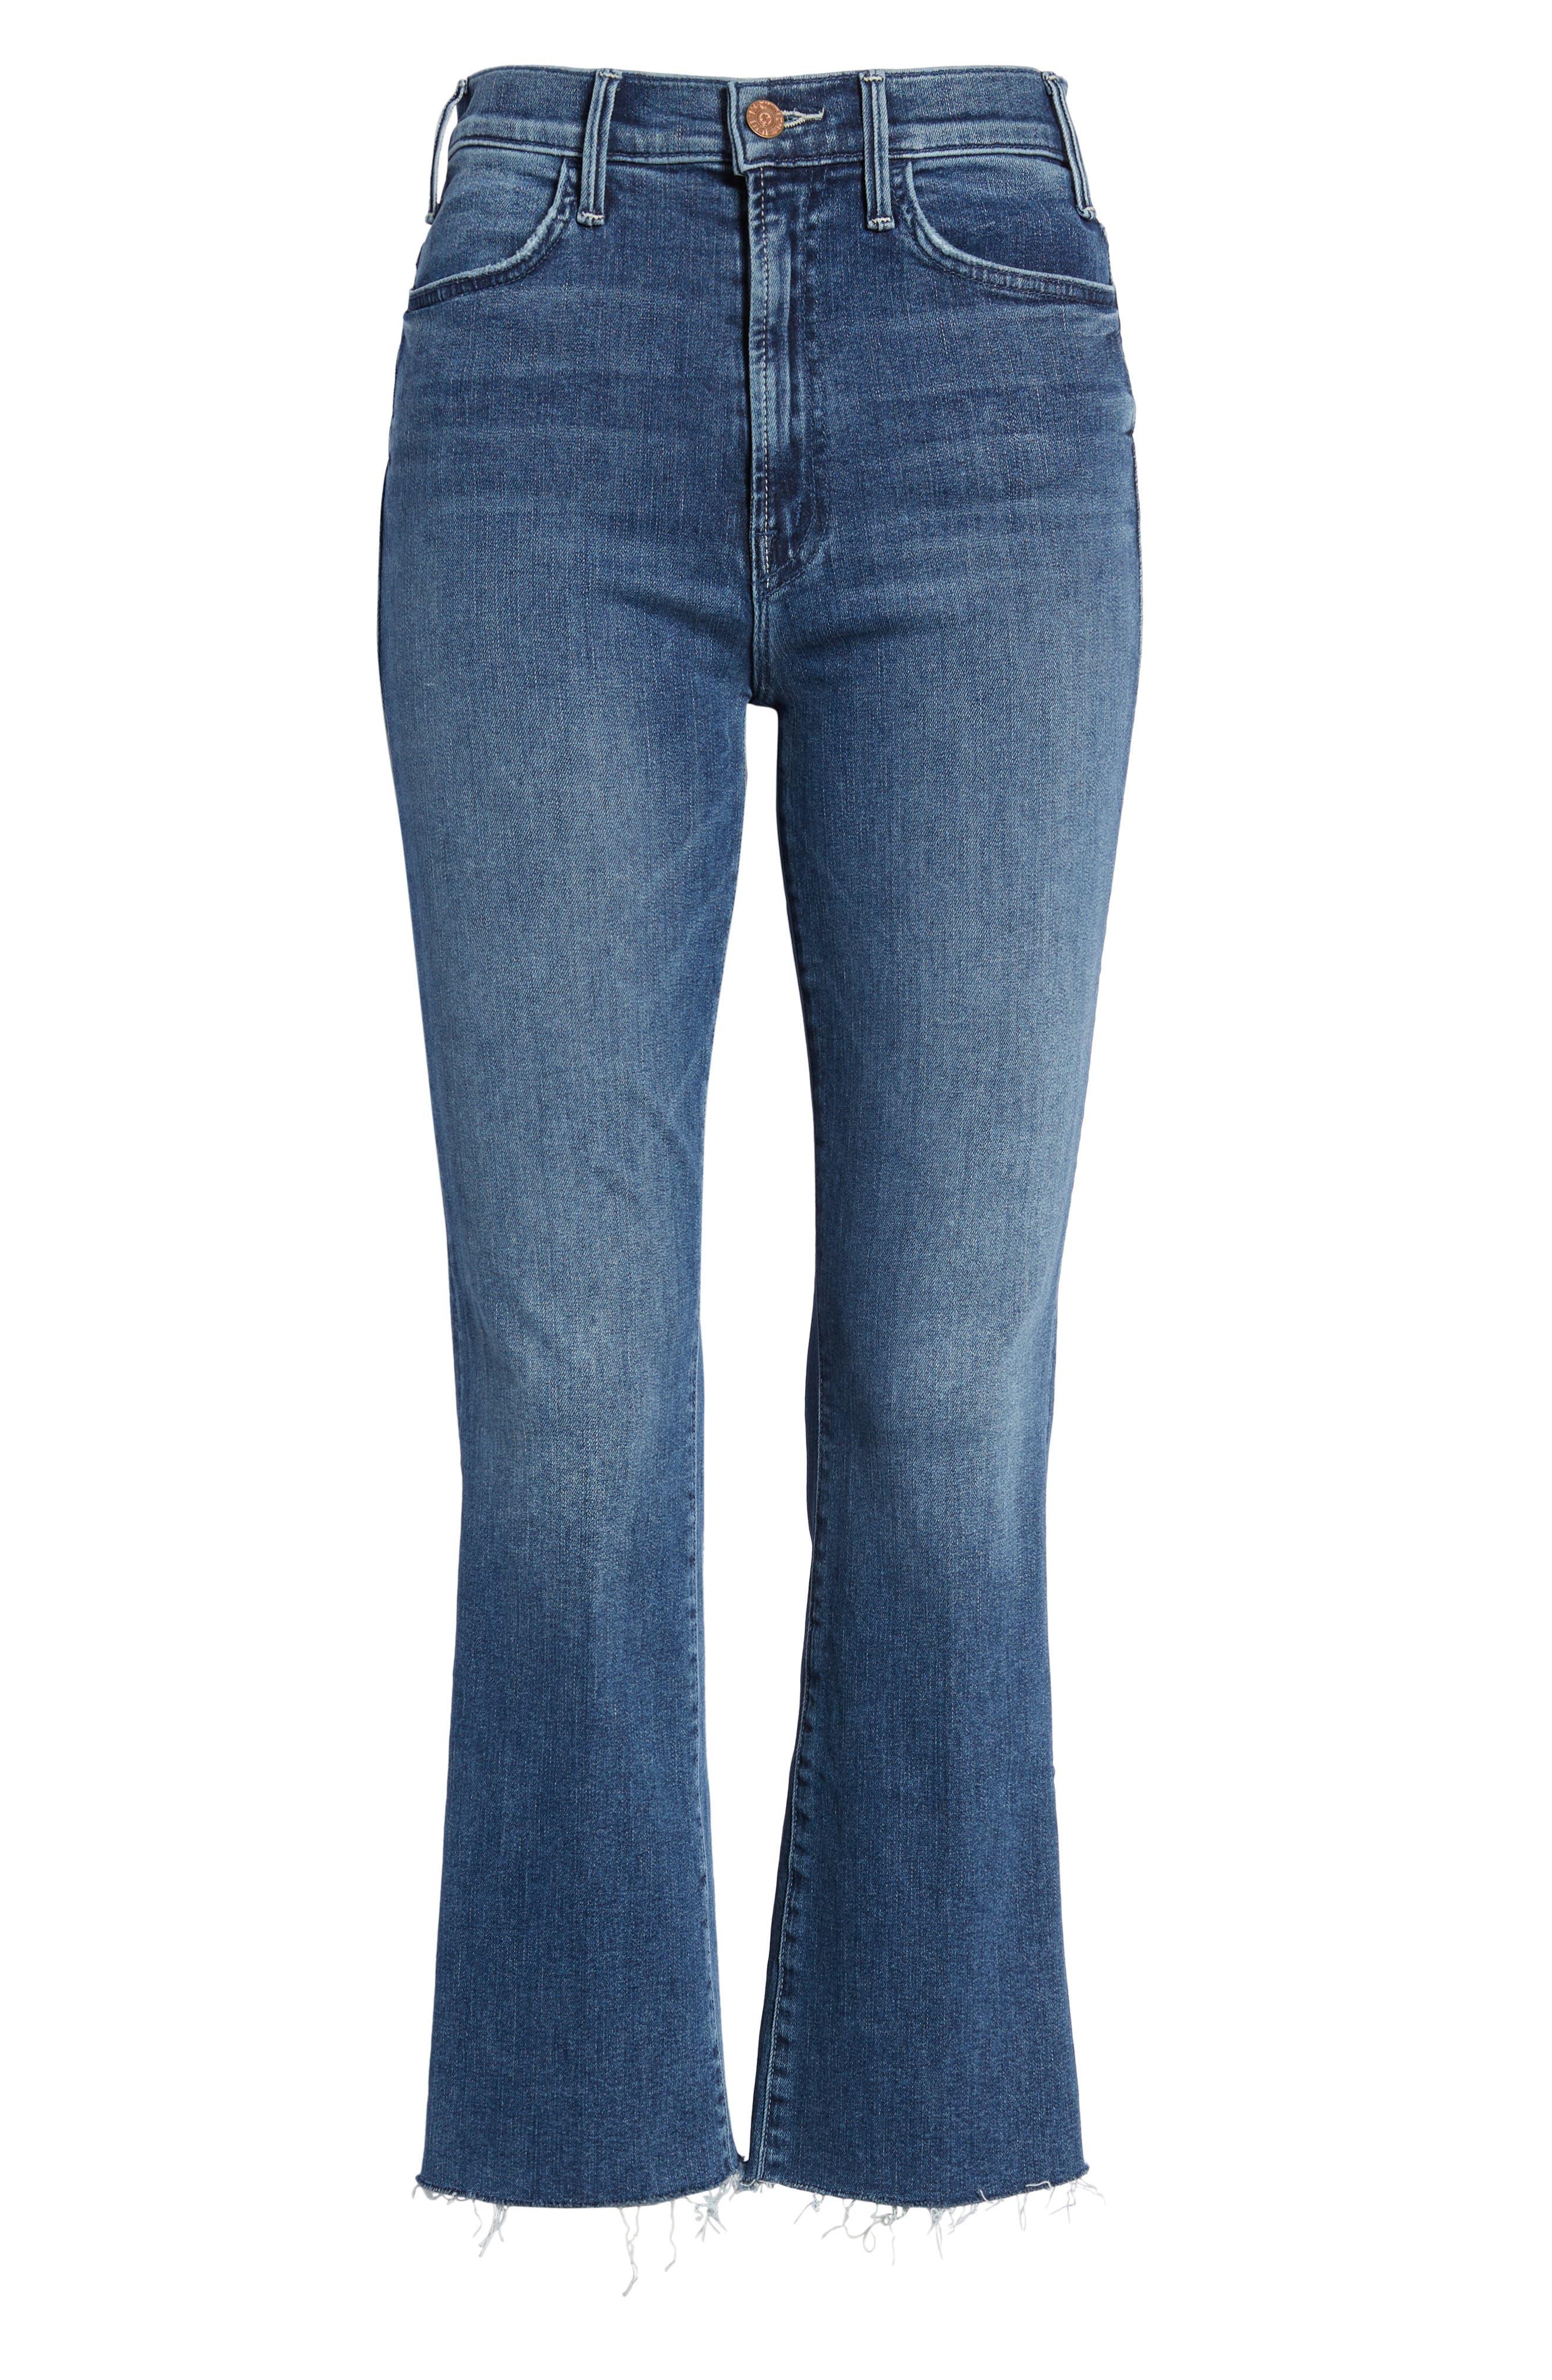 Hustler Fray Ankle Bootcut Jeans,                             Alternate thumbnail 7, color,                             GROOVIN